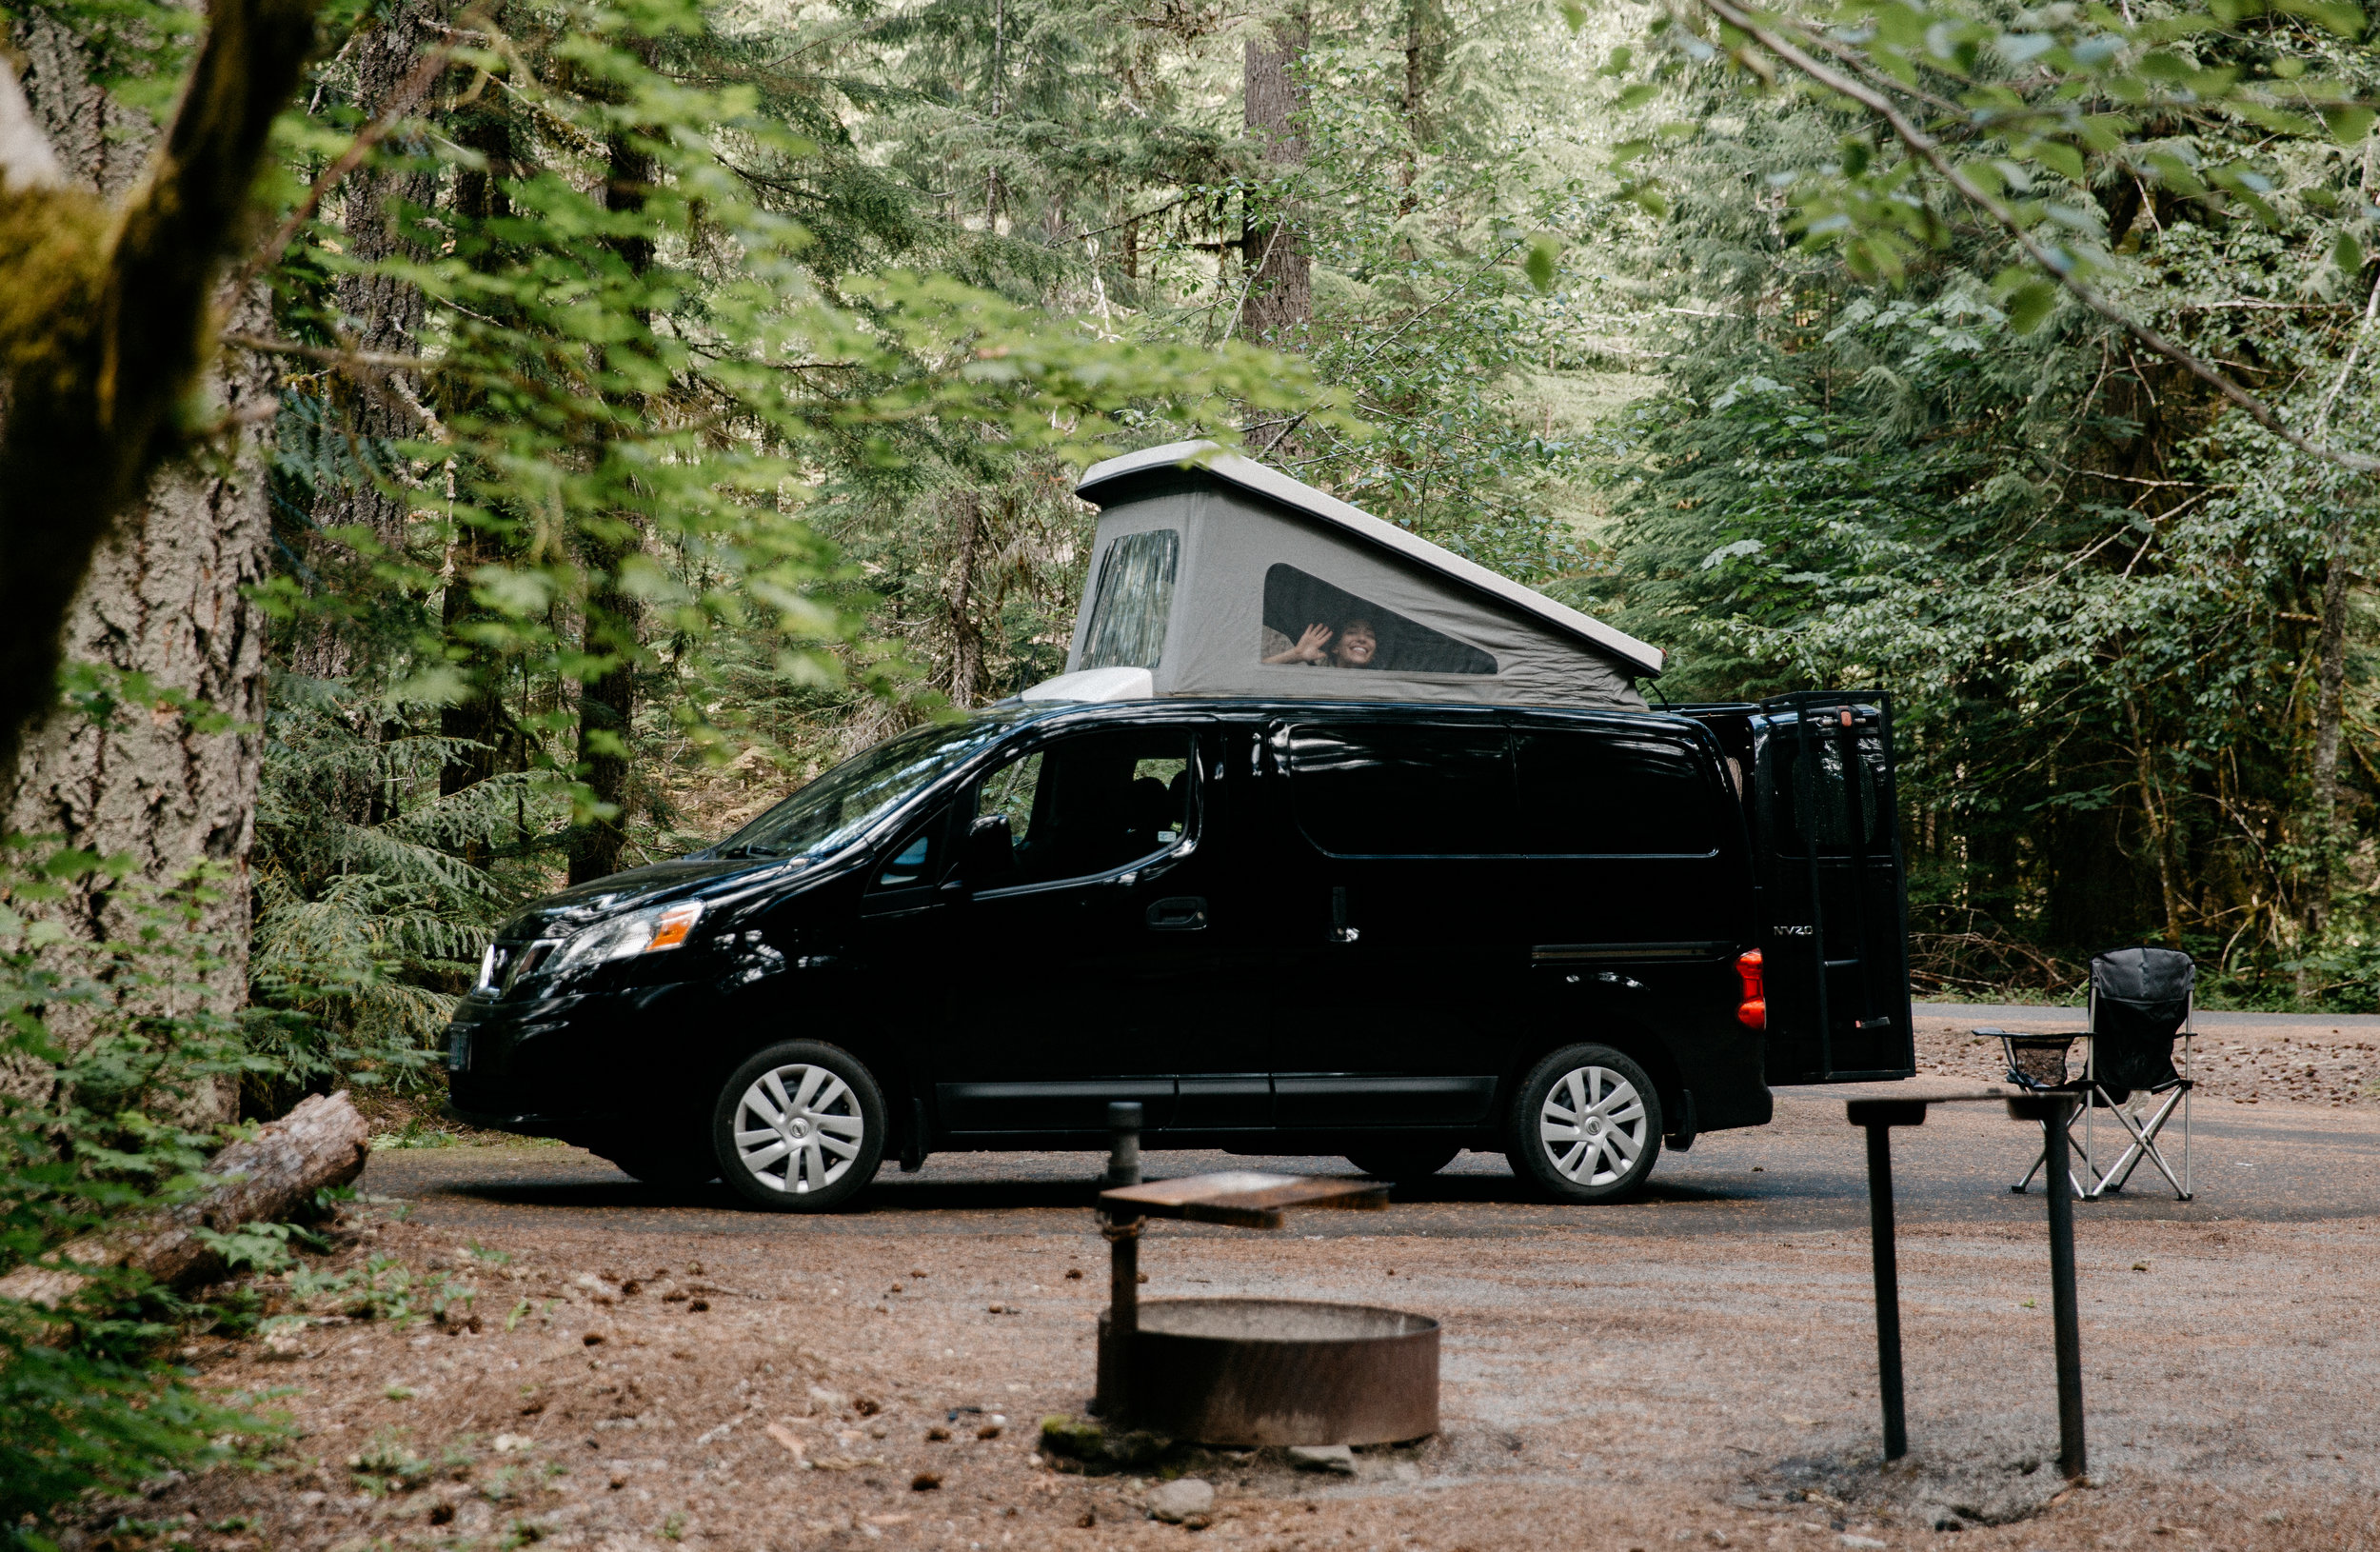 OregonGoCamp+SarahValencia-146.jpg